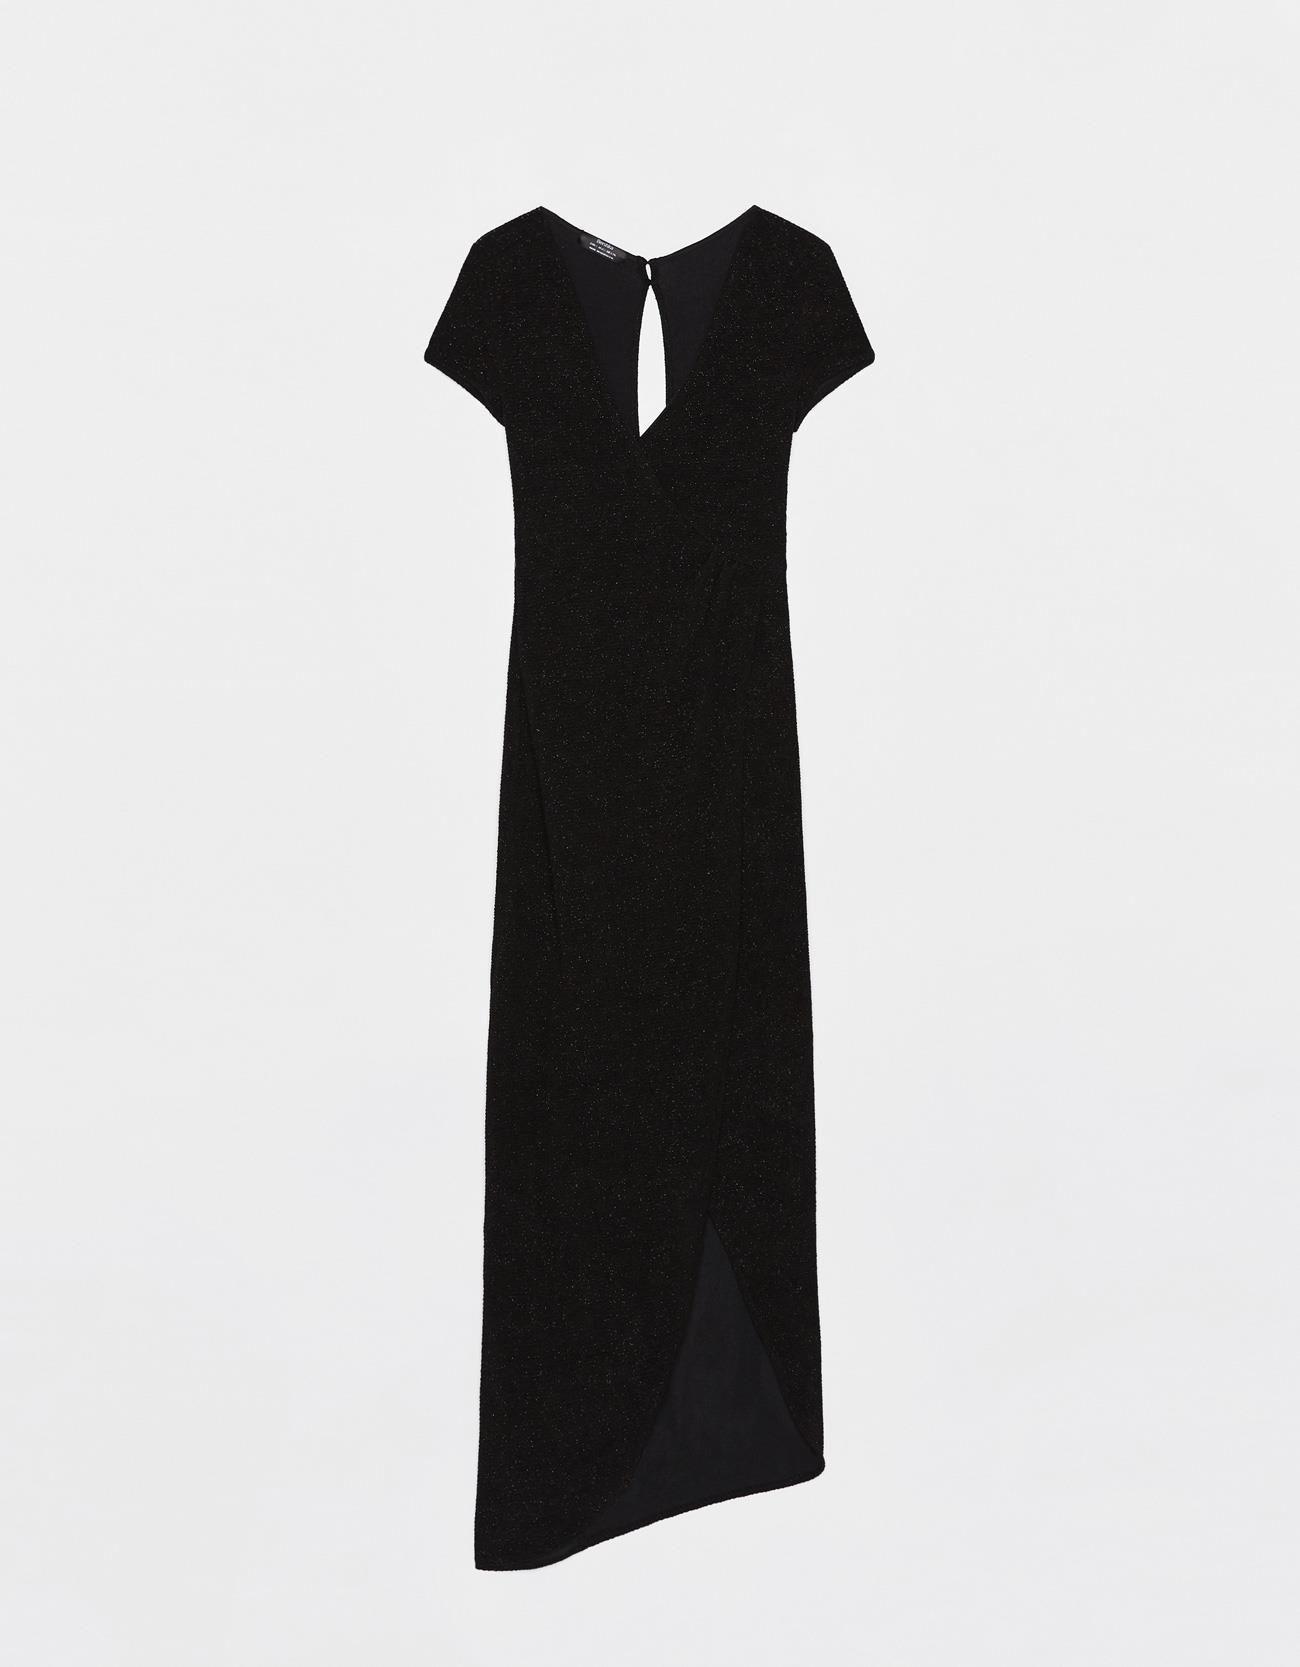 3140363f16 vestido de invitada primavera verano 2019 negro. Vestido negro